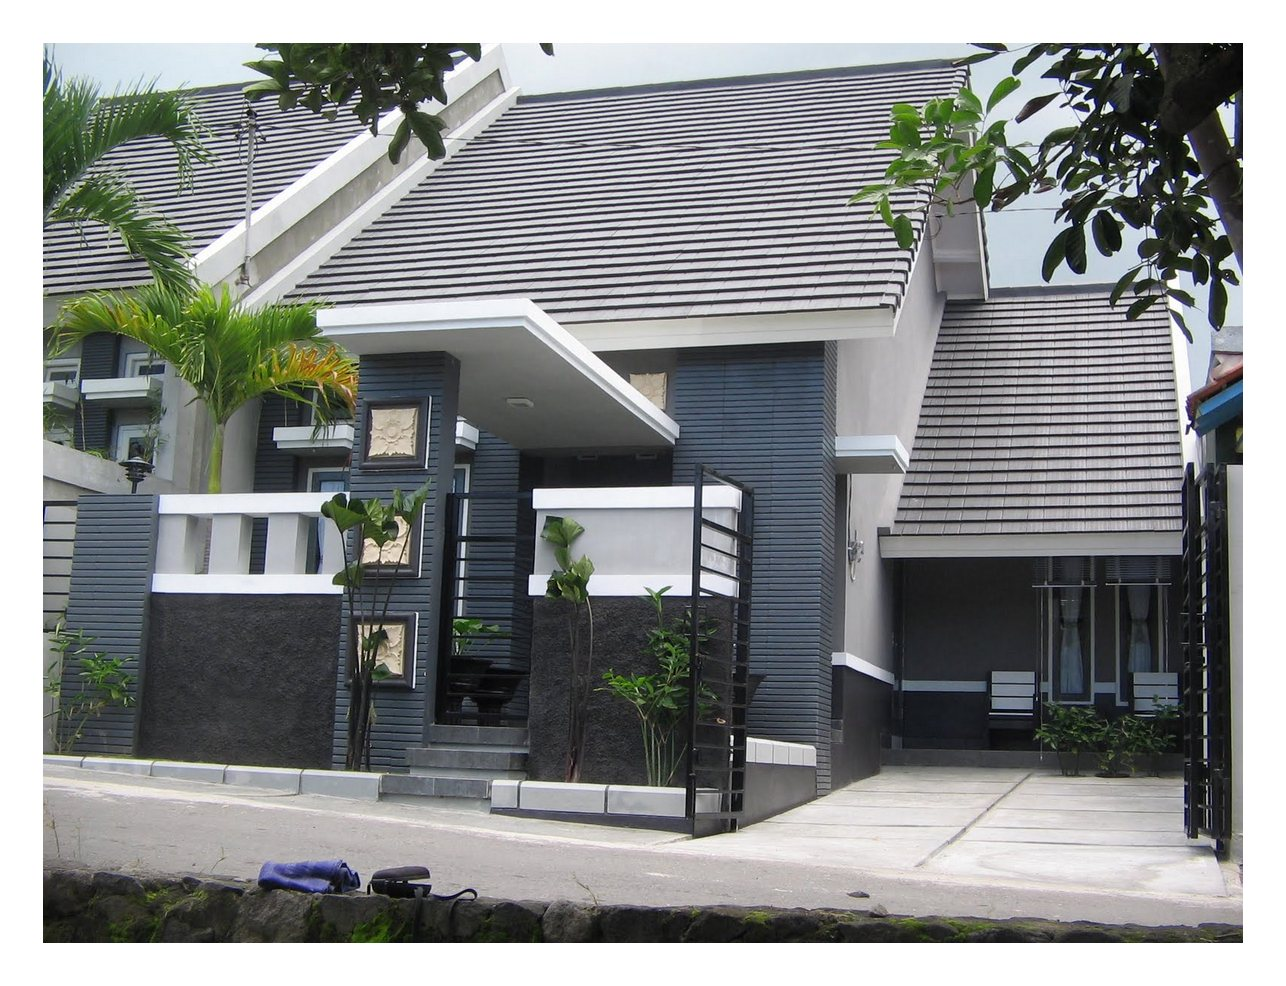 21 Model Rumah Sederhana Tapi Kelihatan Mewah Terbaru 2019